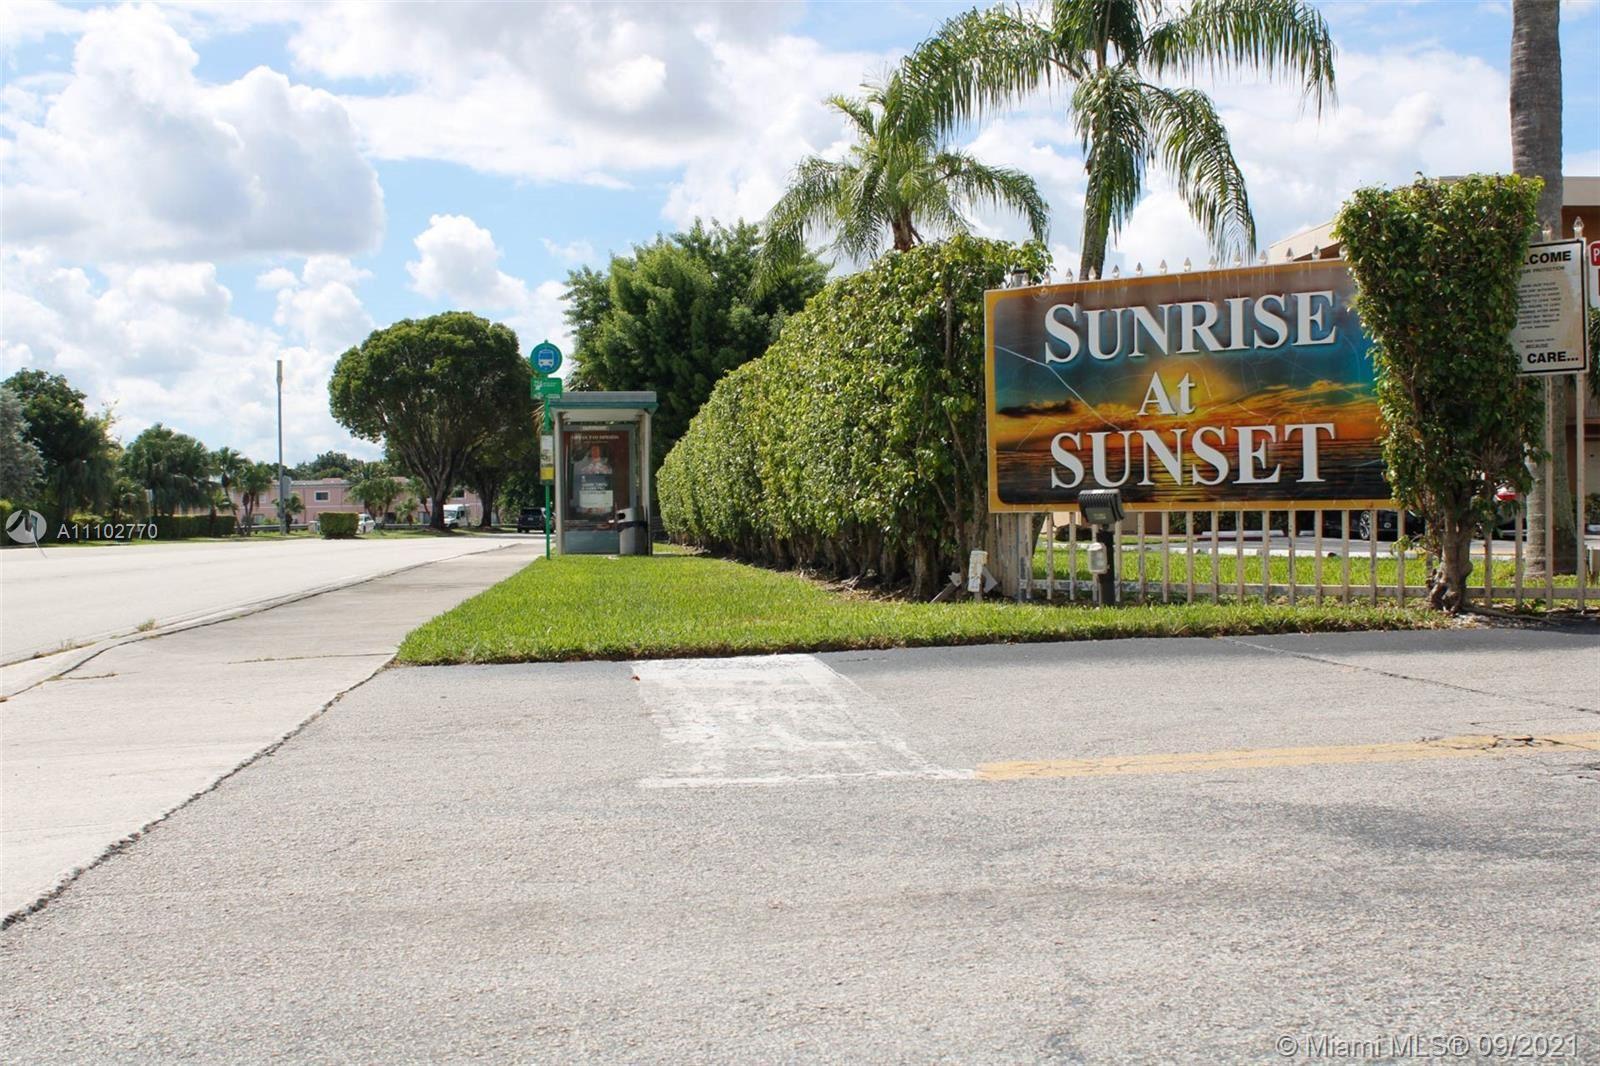 7510 SW 152nd Ave #A103, Miami, FL 33193 - #: A11102770